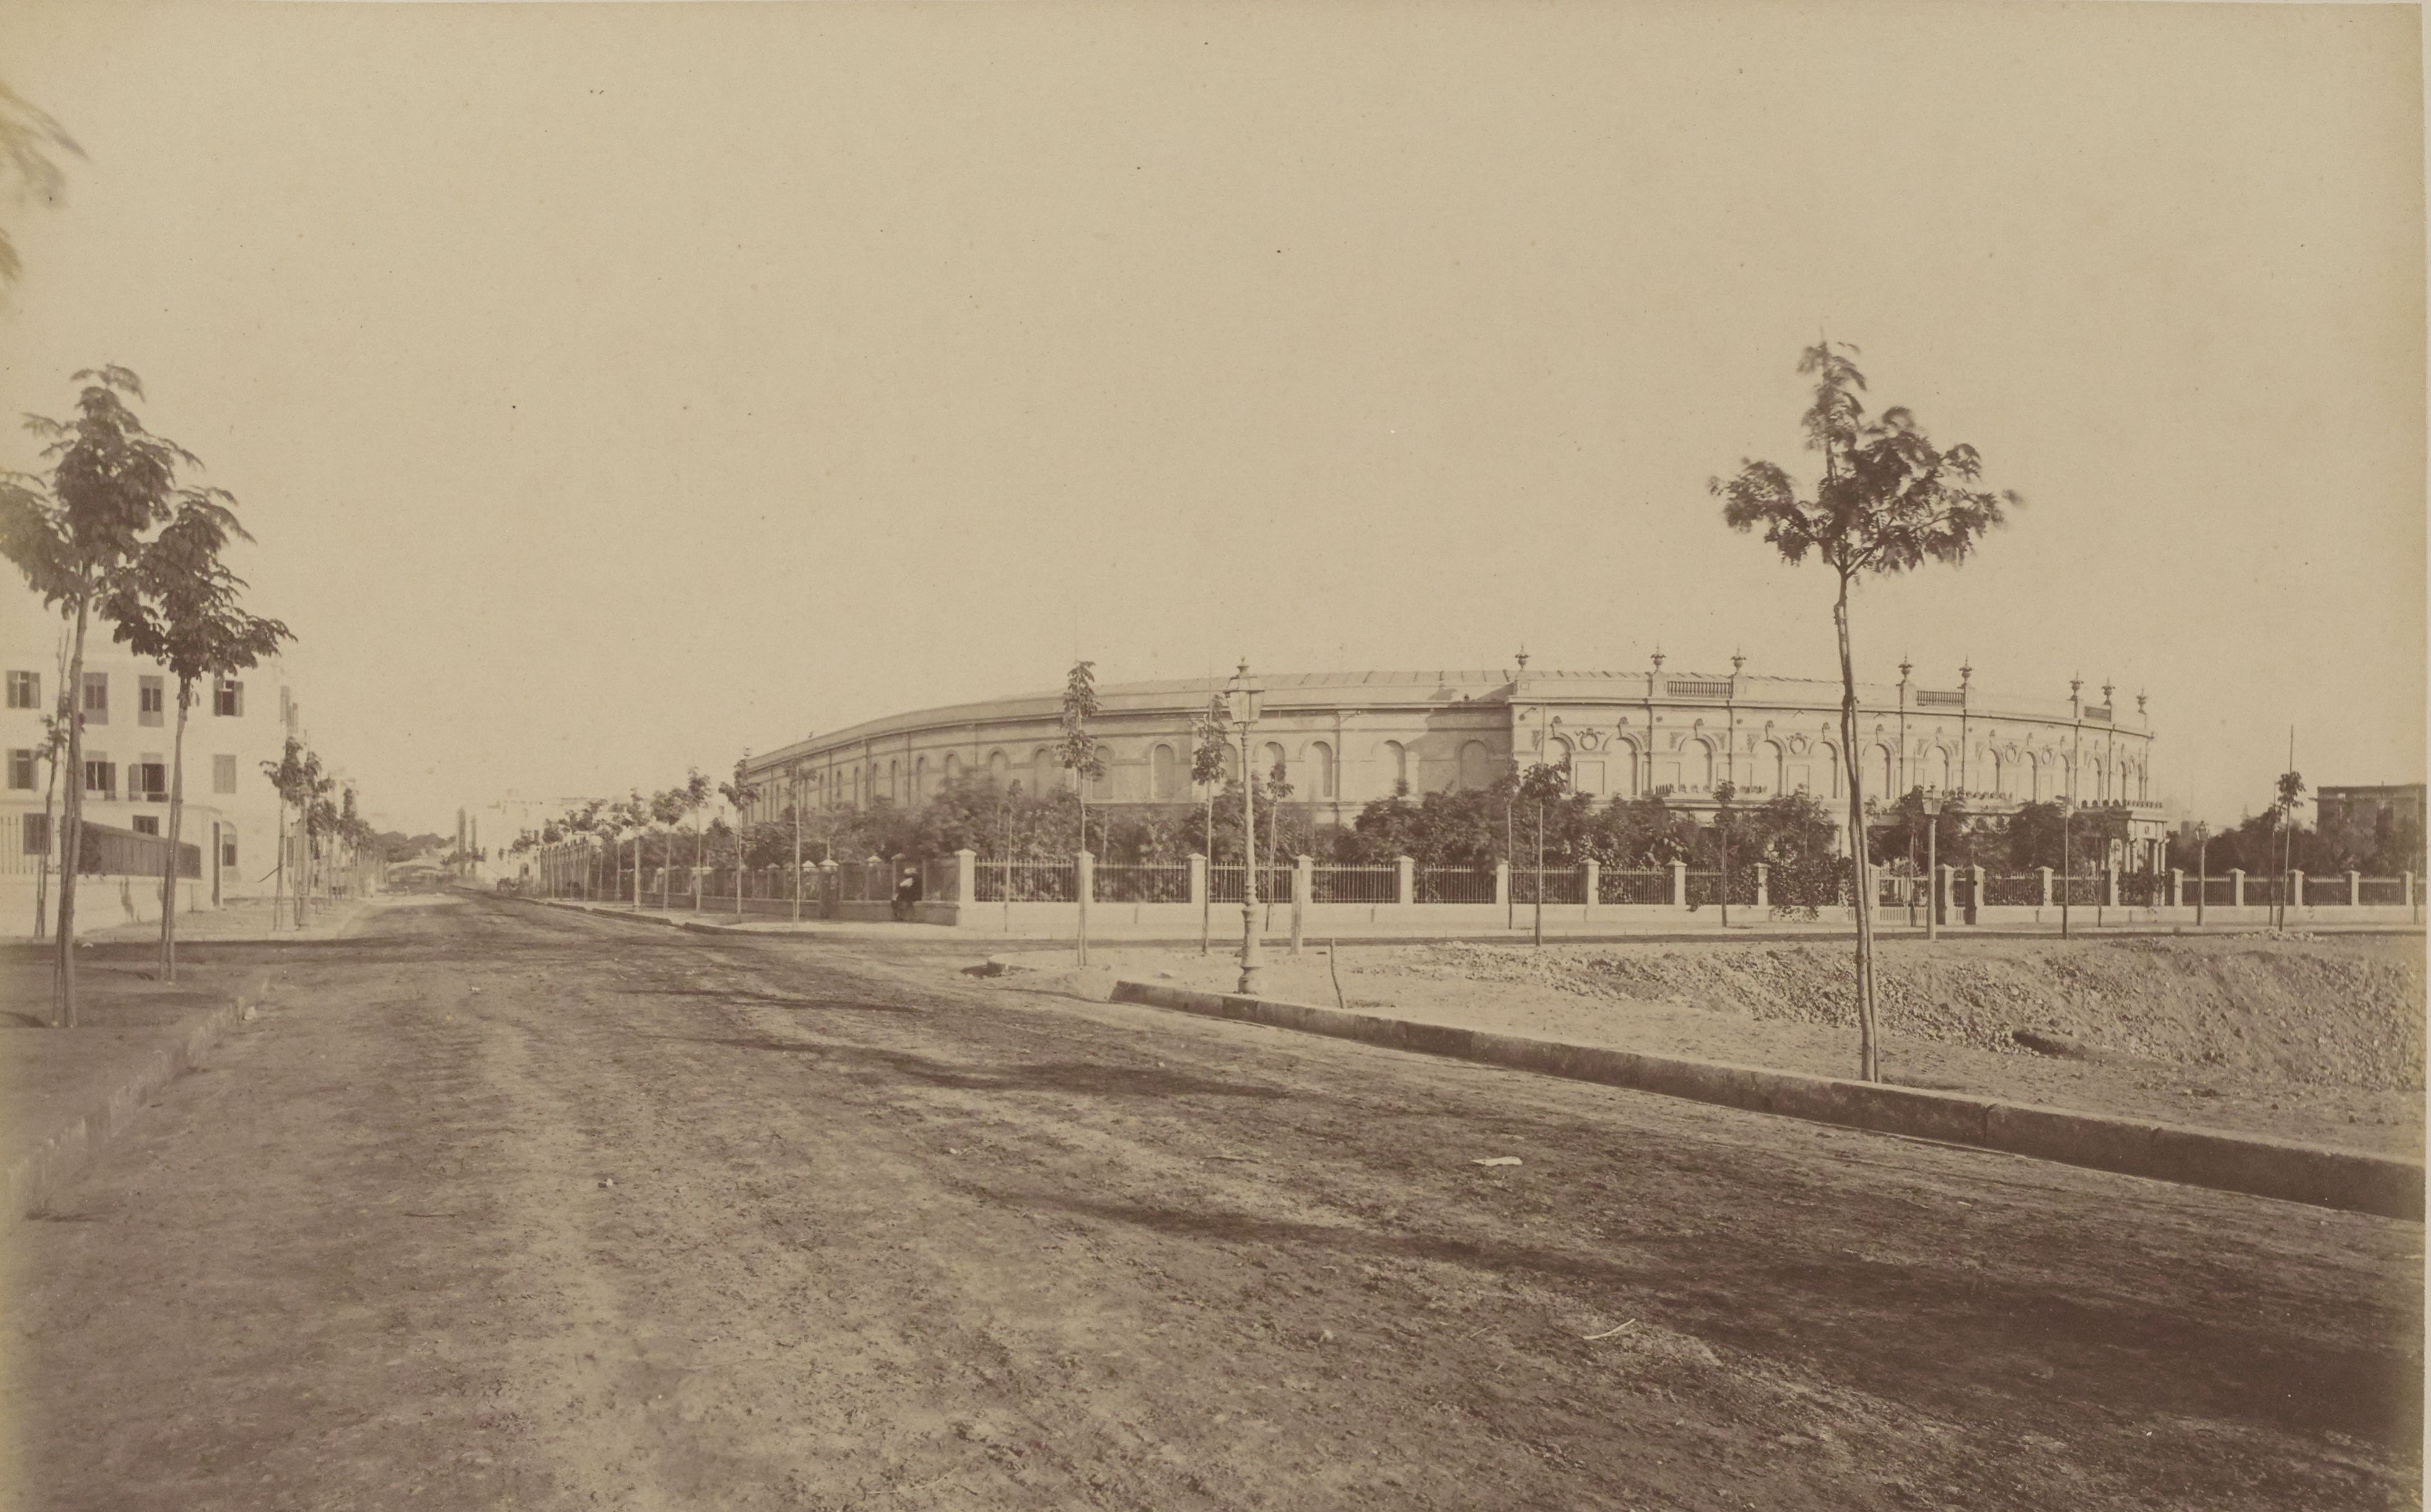 16. Вид ипподрома на углу улиц Мадабег и Манах